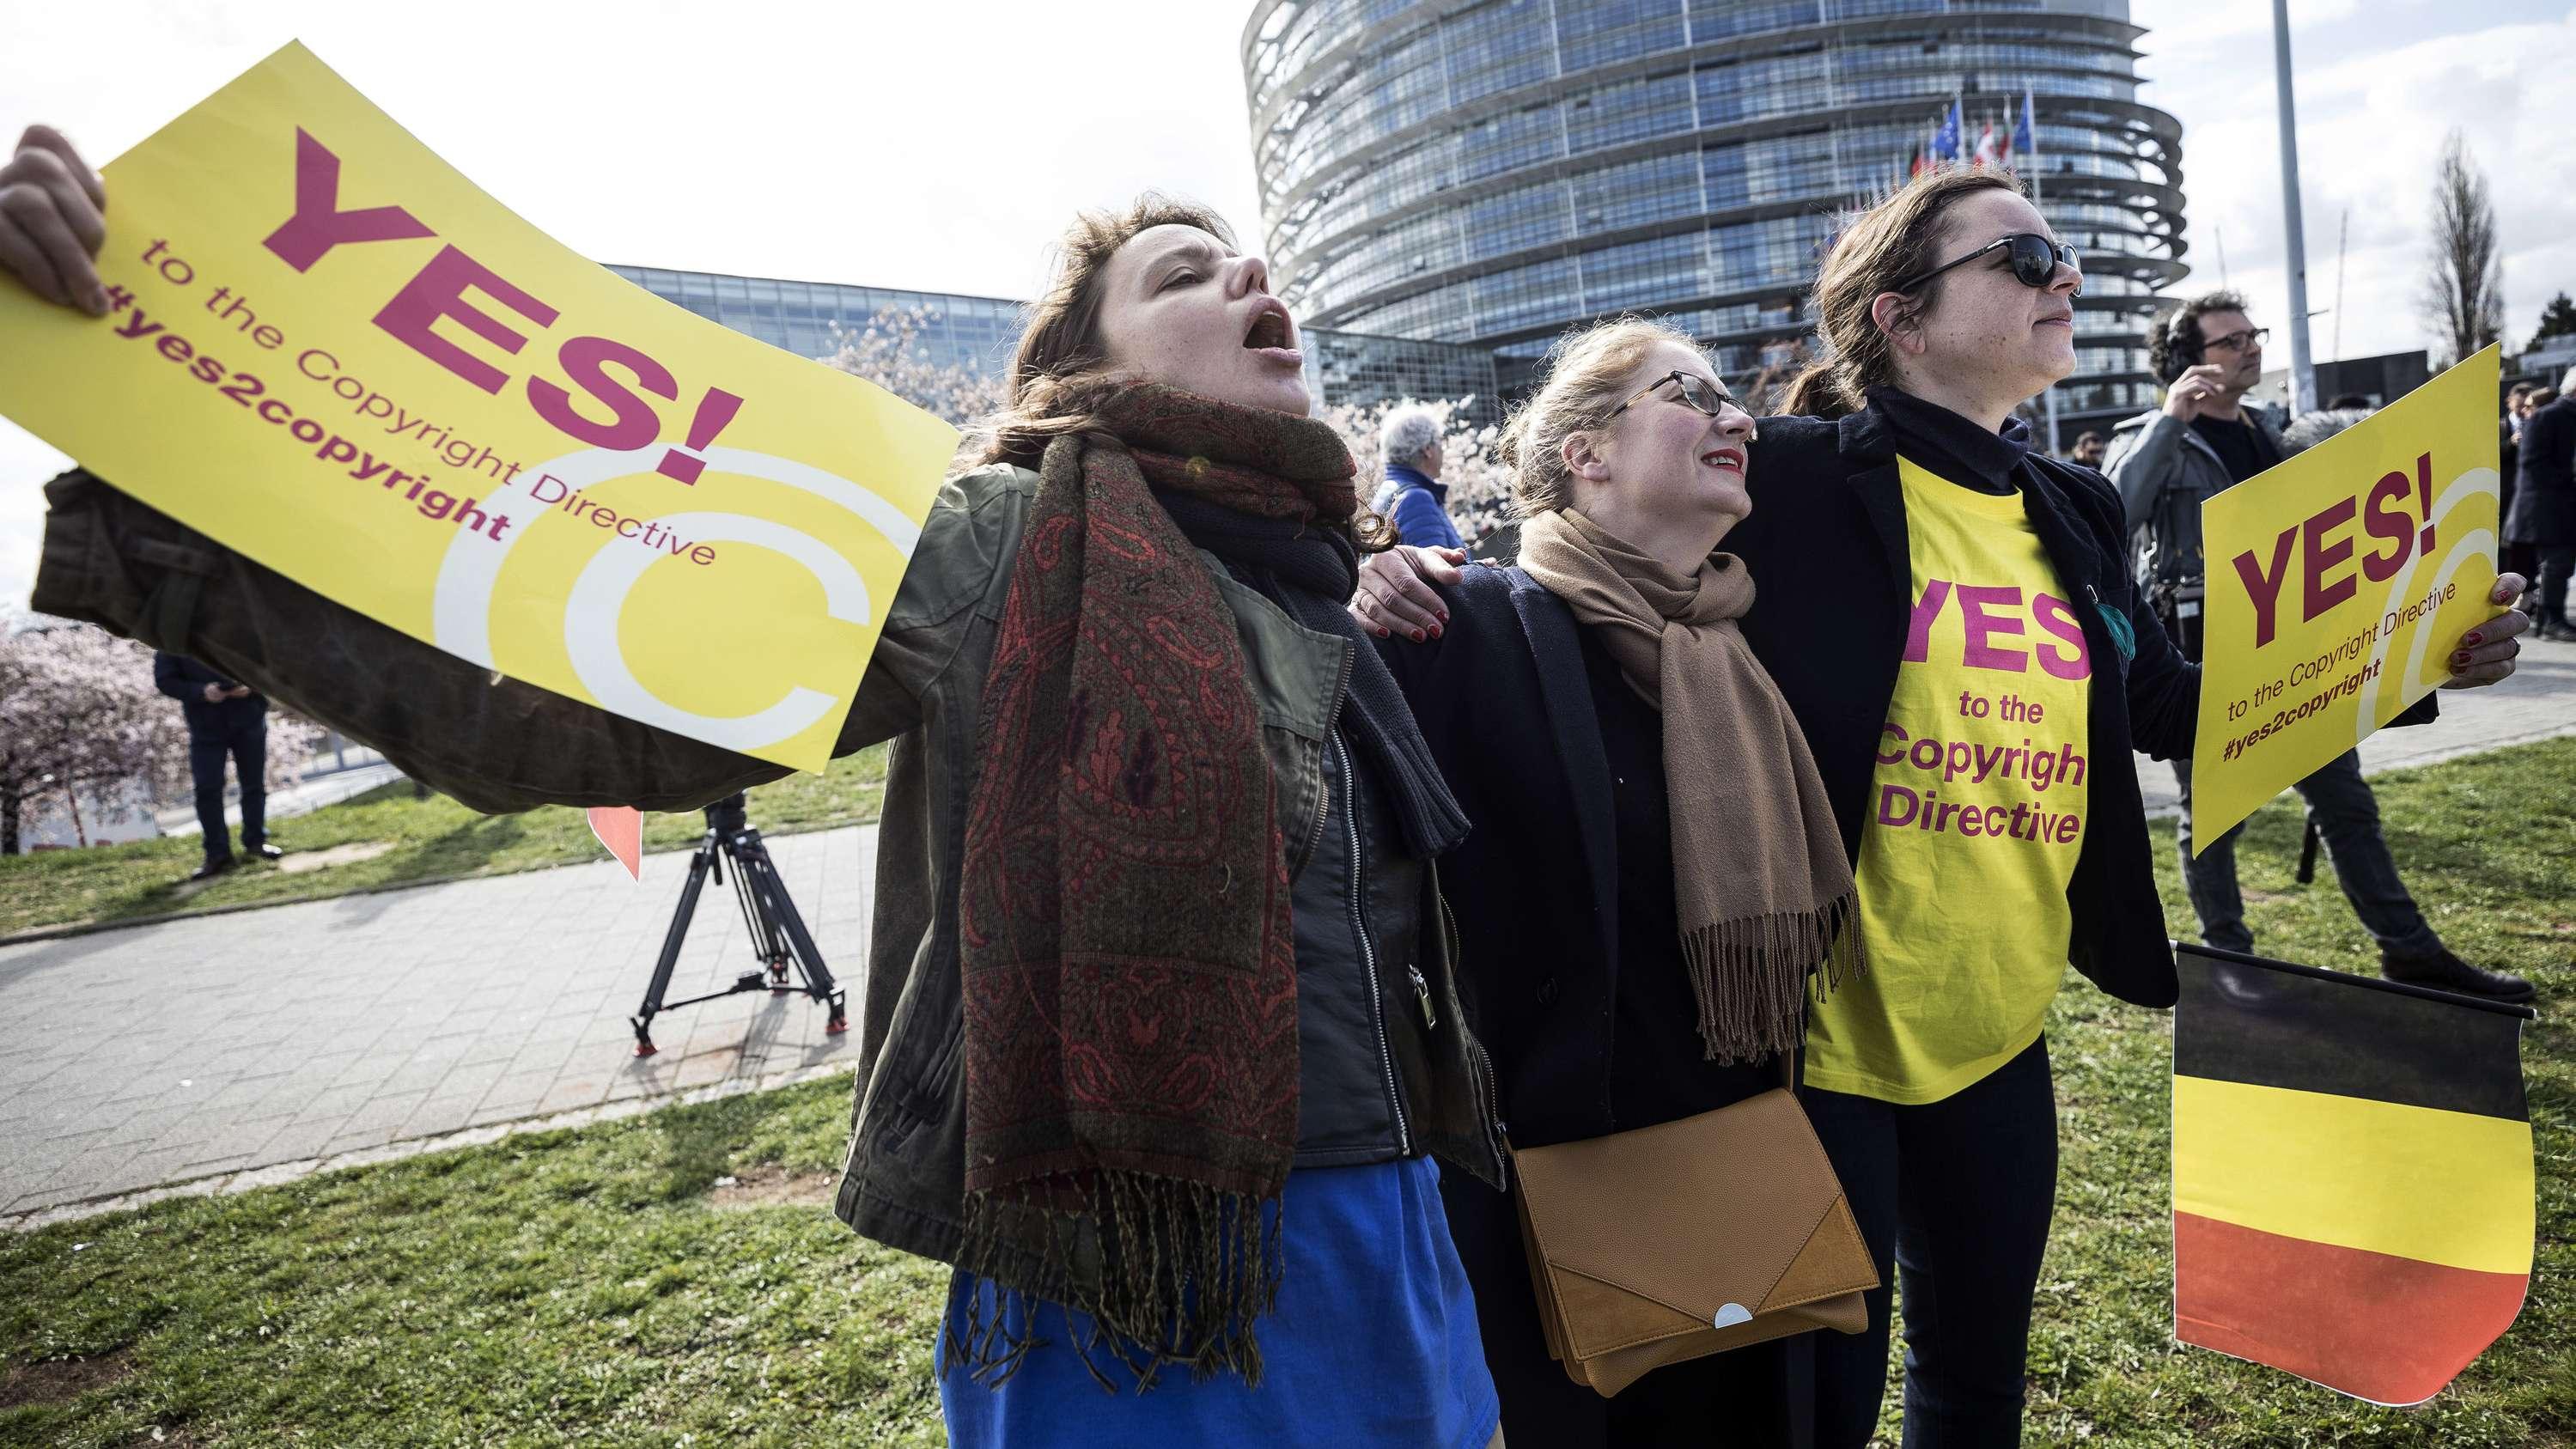 26.3., Straßburg: Demonstranten vor dem Europäischen Parlament